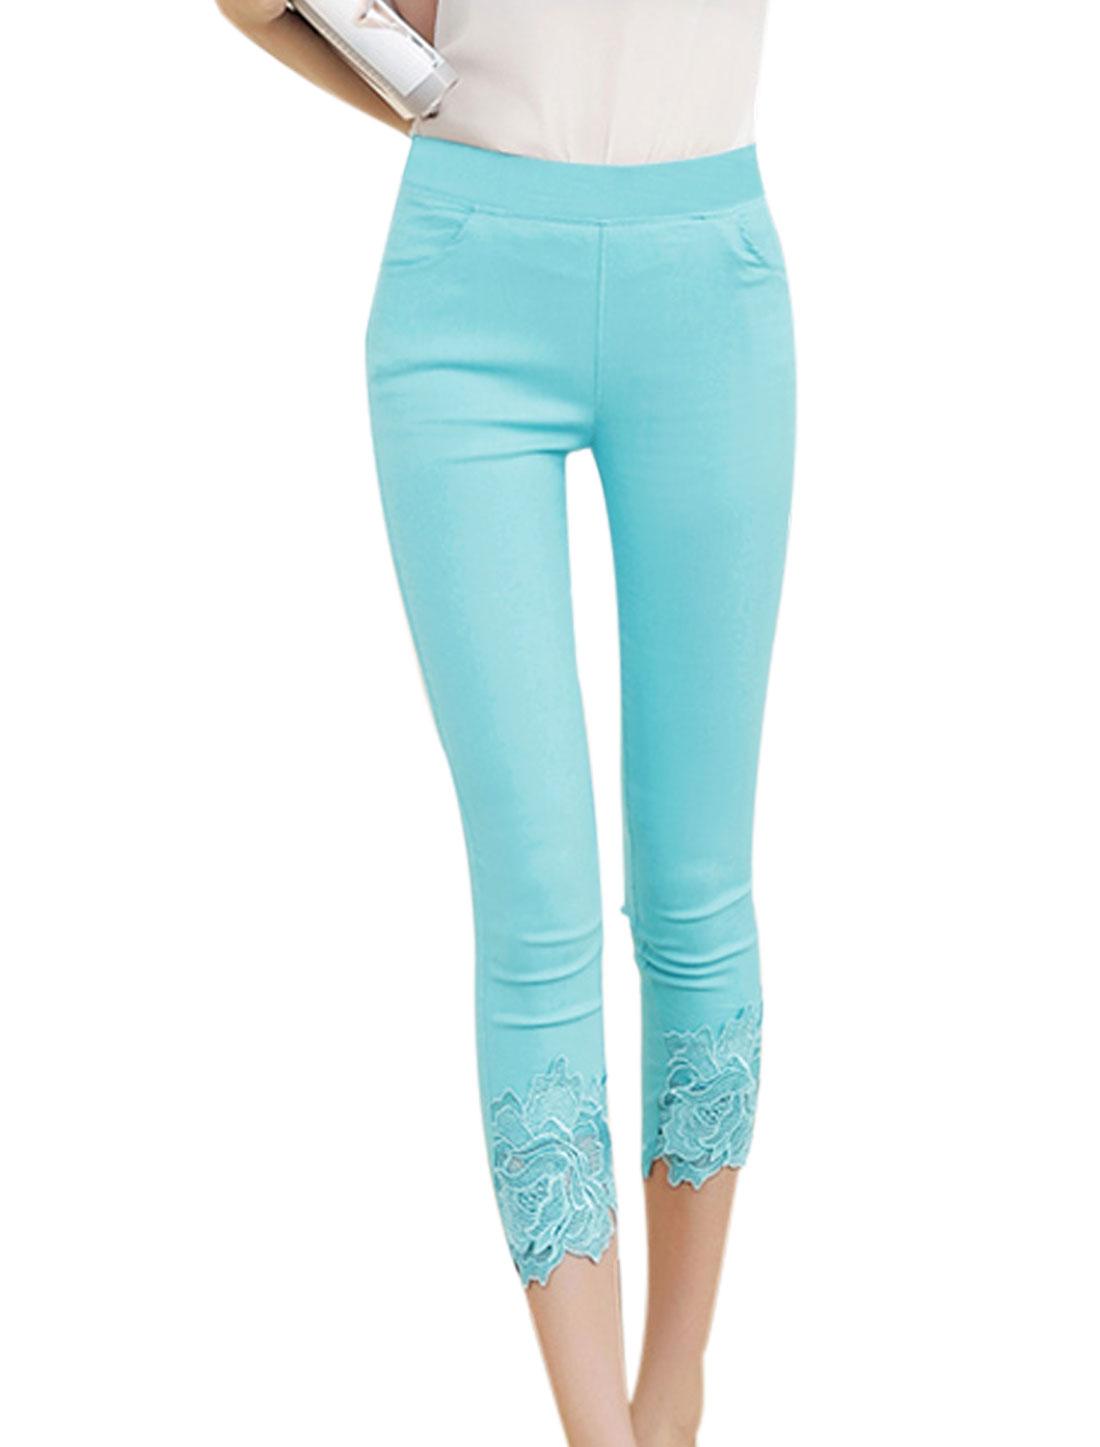 Lady Two Slant Pockets Skinny Casual Capri Pants Sky Blue XS